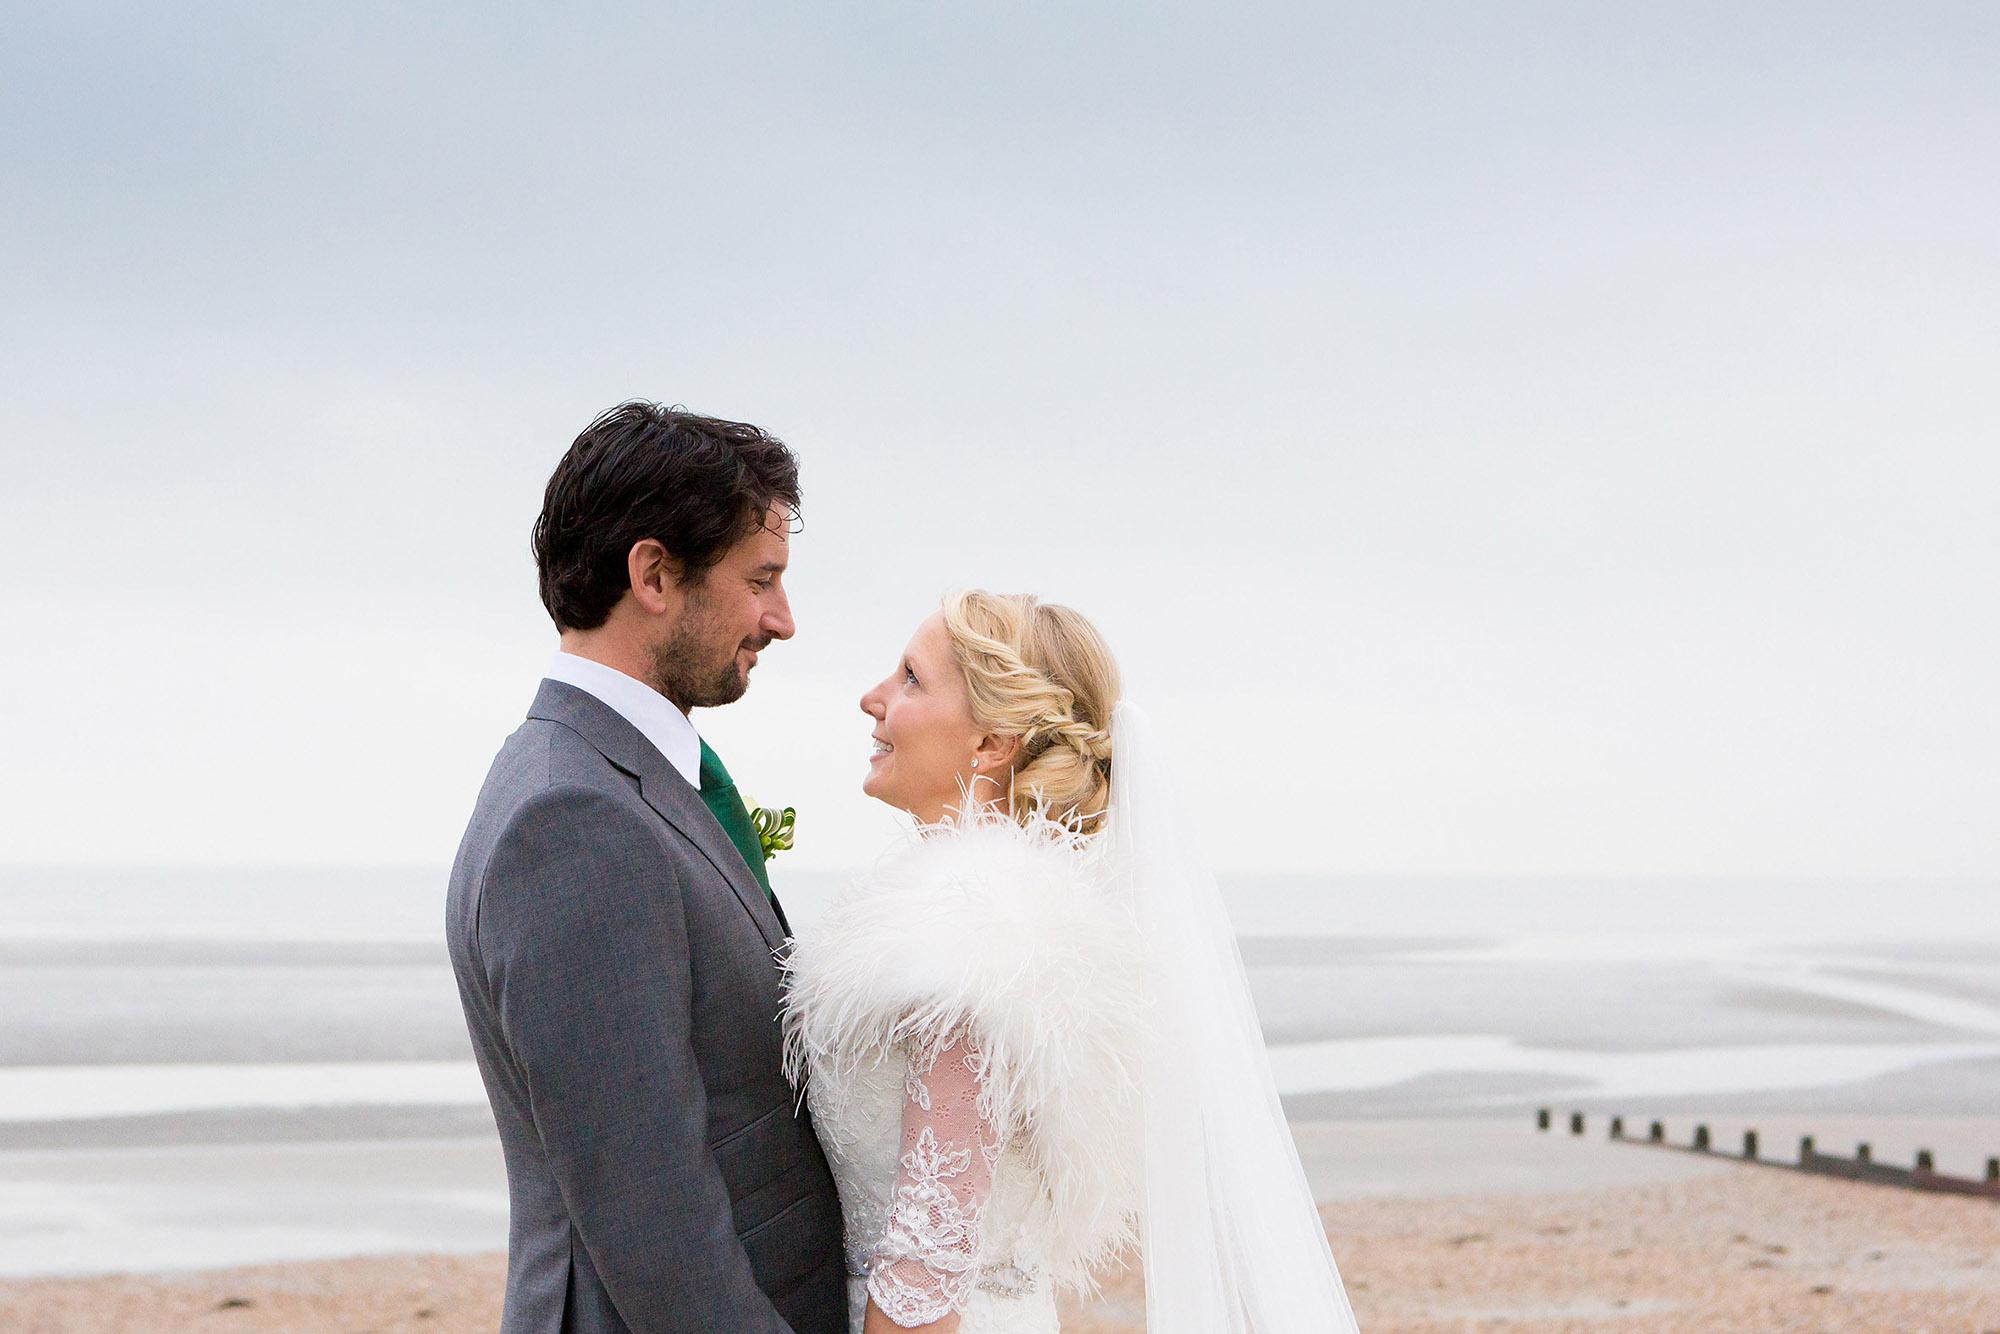 julia-toms-featured-weddings-west-sussex-007.jpg